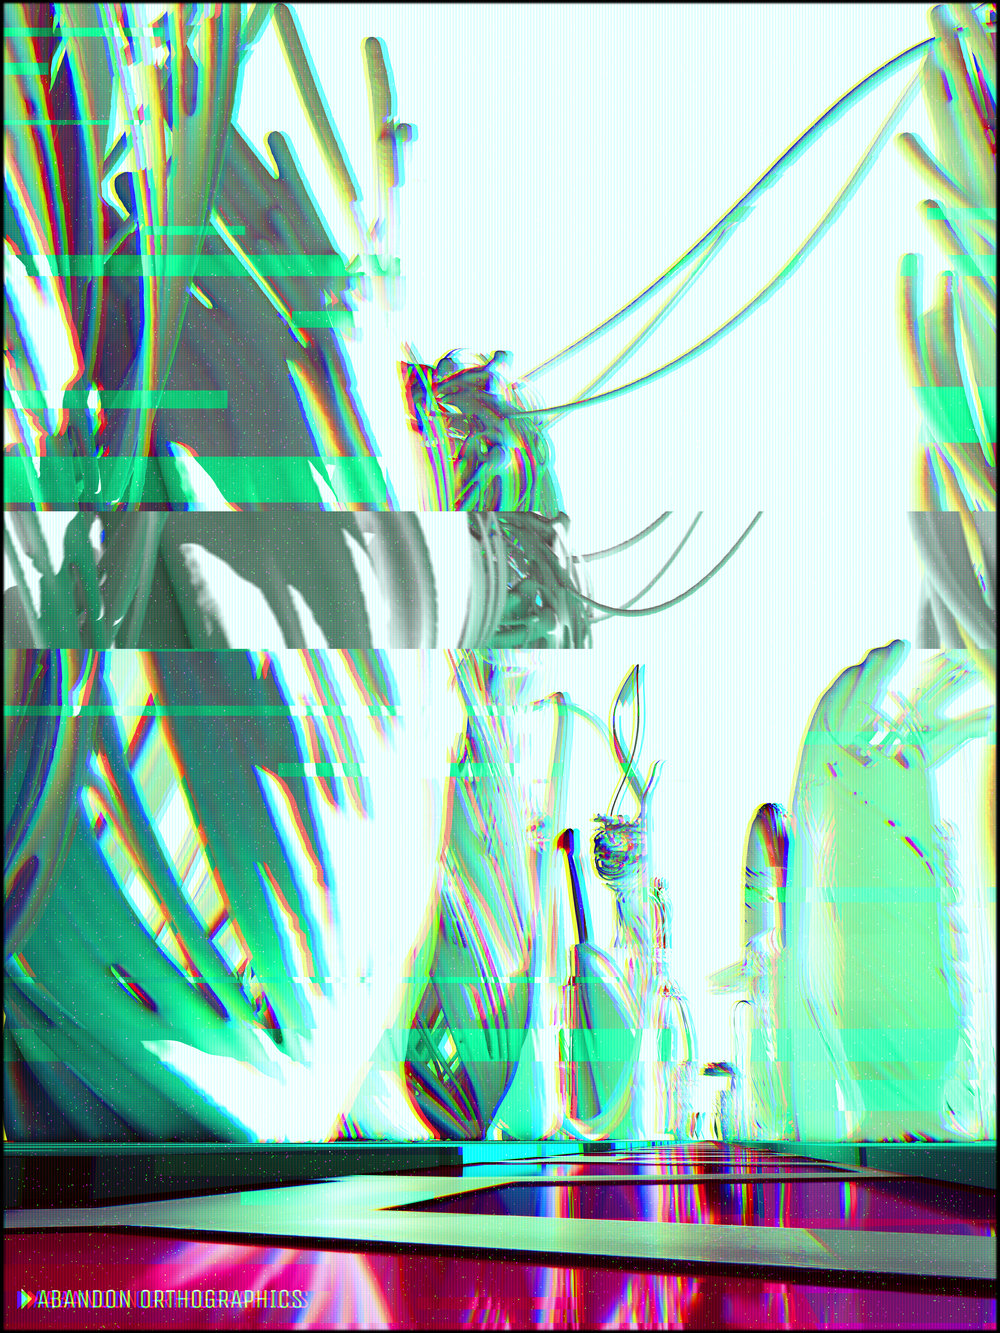 VHS-ABANDON-ORTHO.jpg